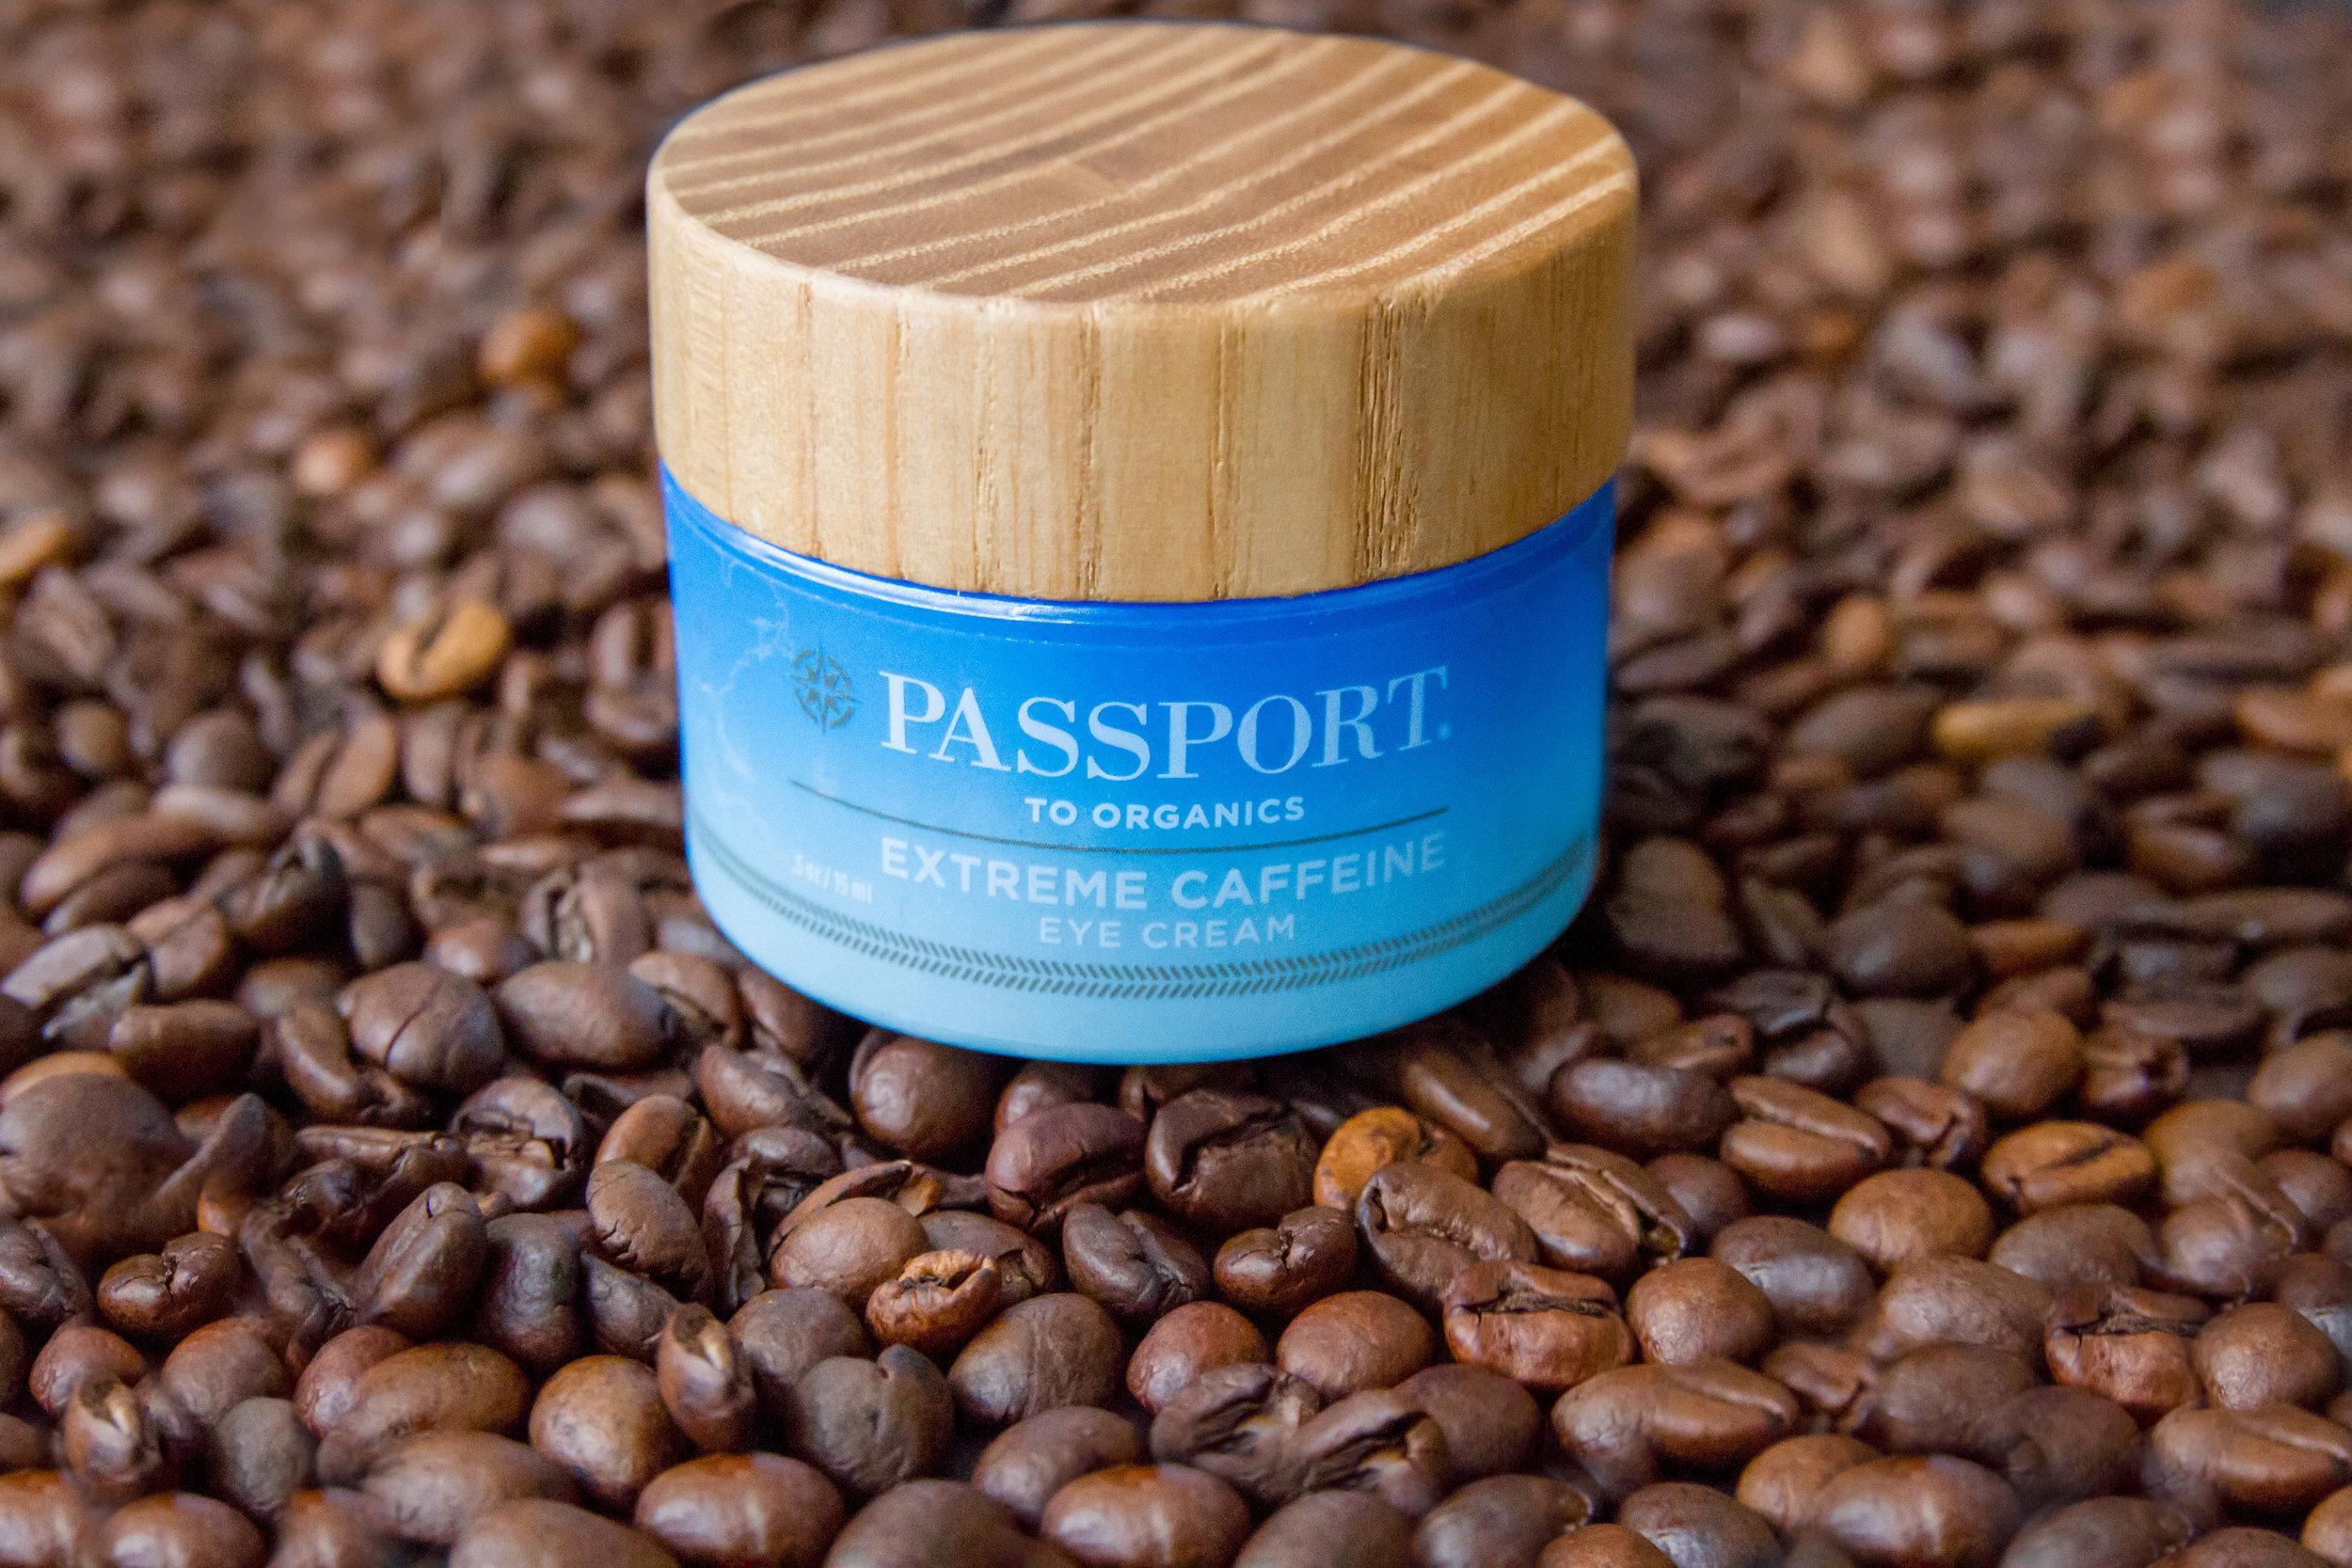 Passport to Organics Skincare